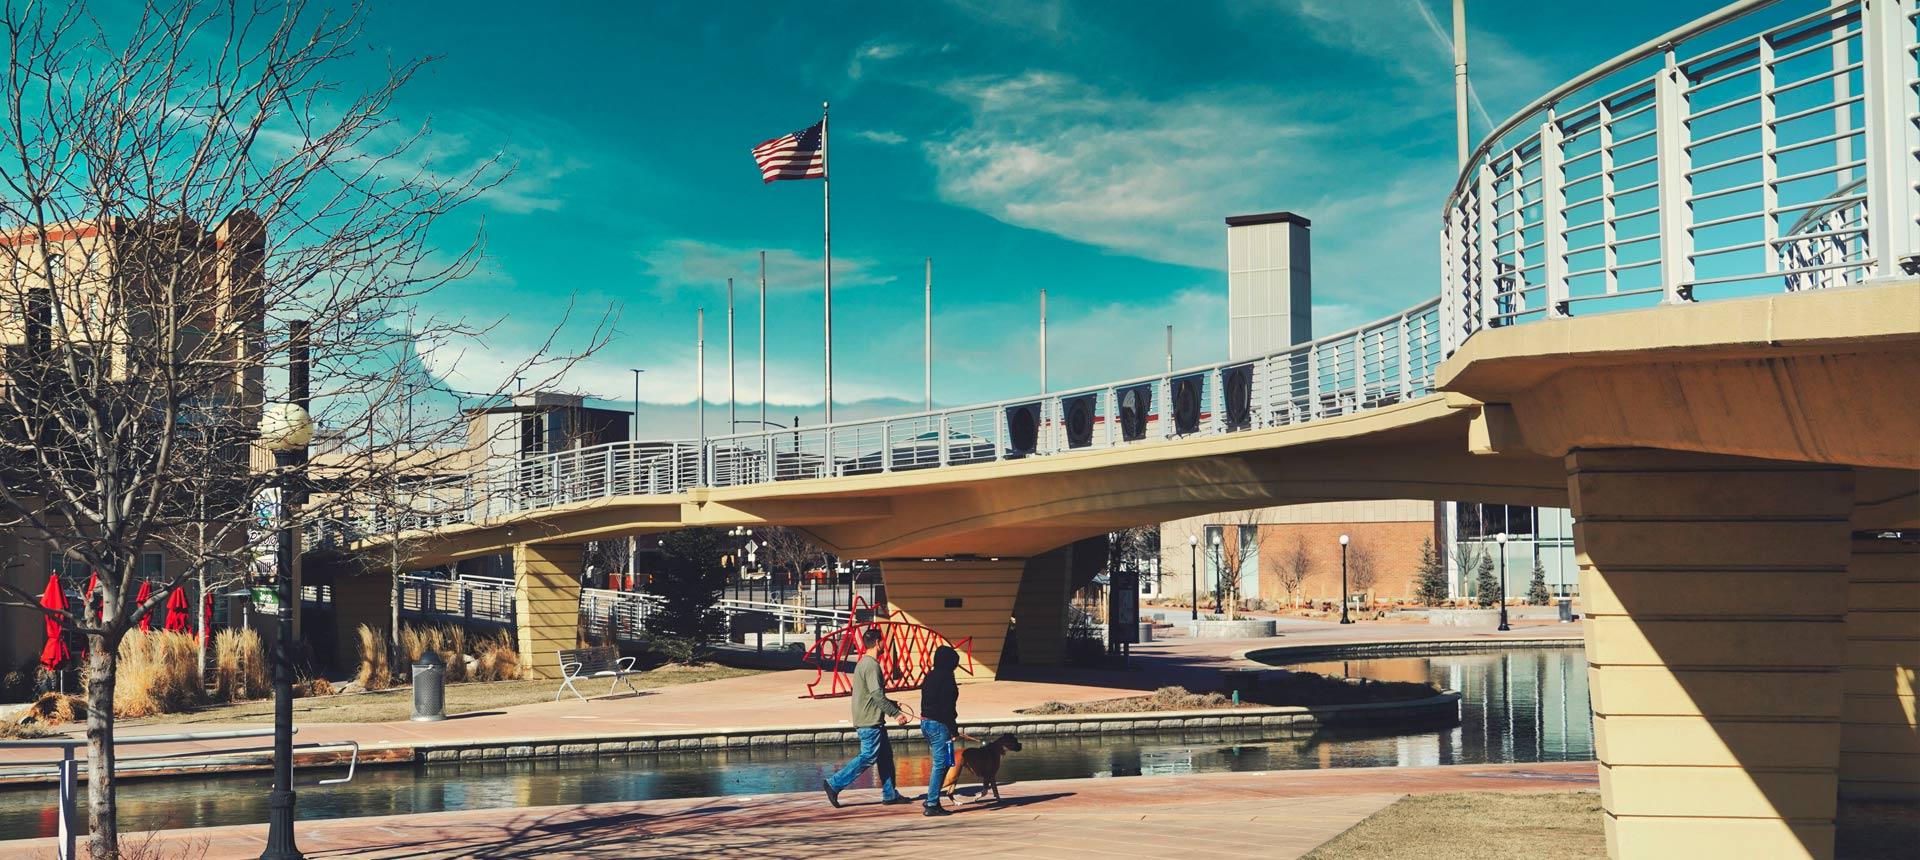 Veterans-Bridge-on-the-Pueblo-Riverwalk